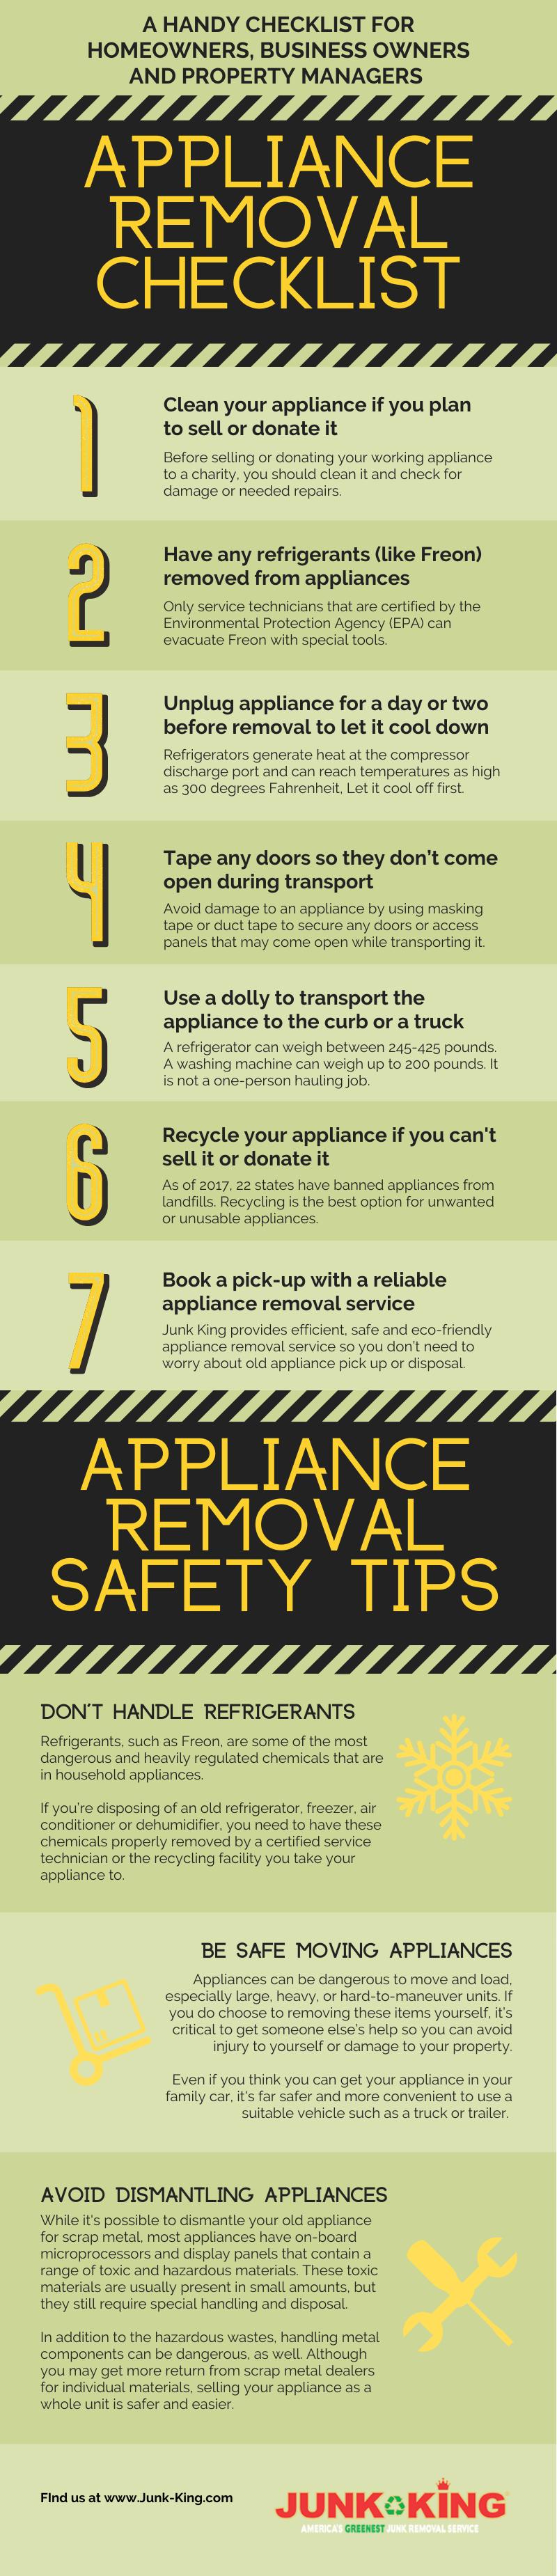 Appliance Removal Checklist